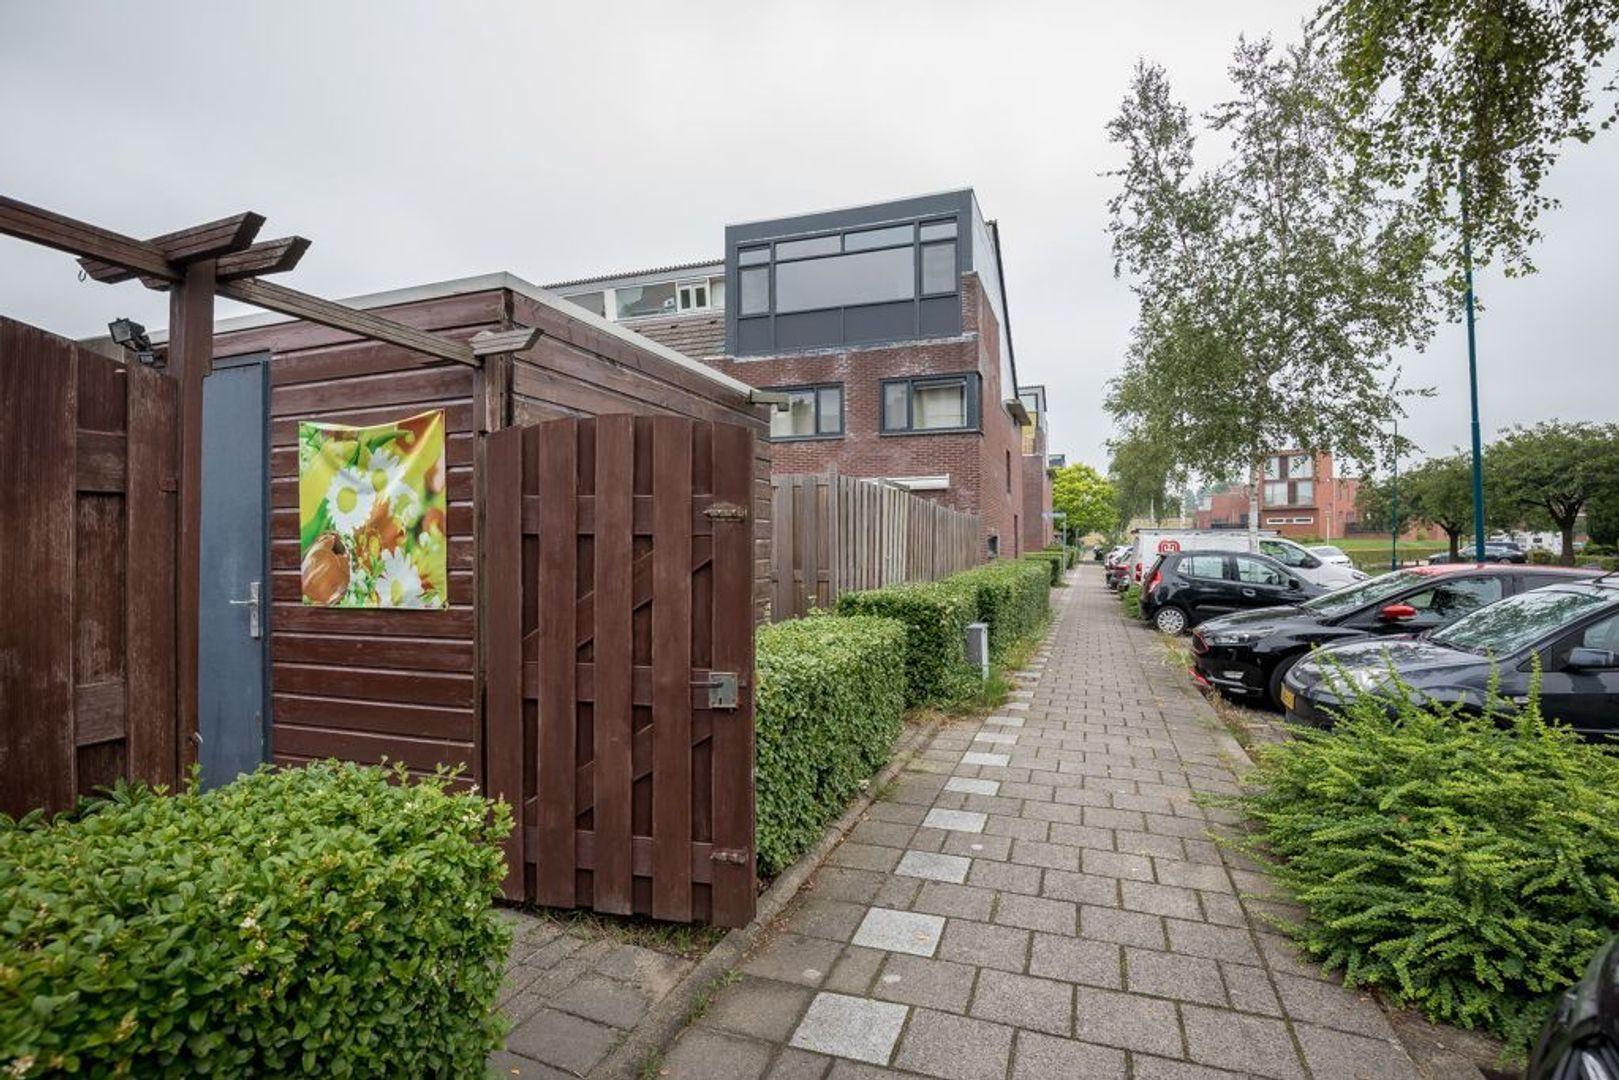 Balsahout 35, Zoetermeer foto-26